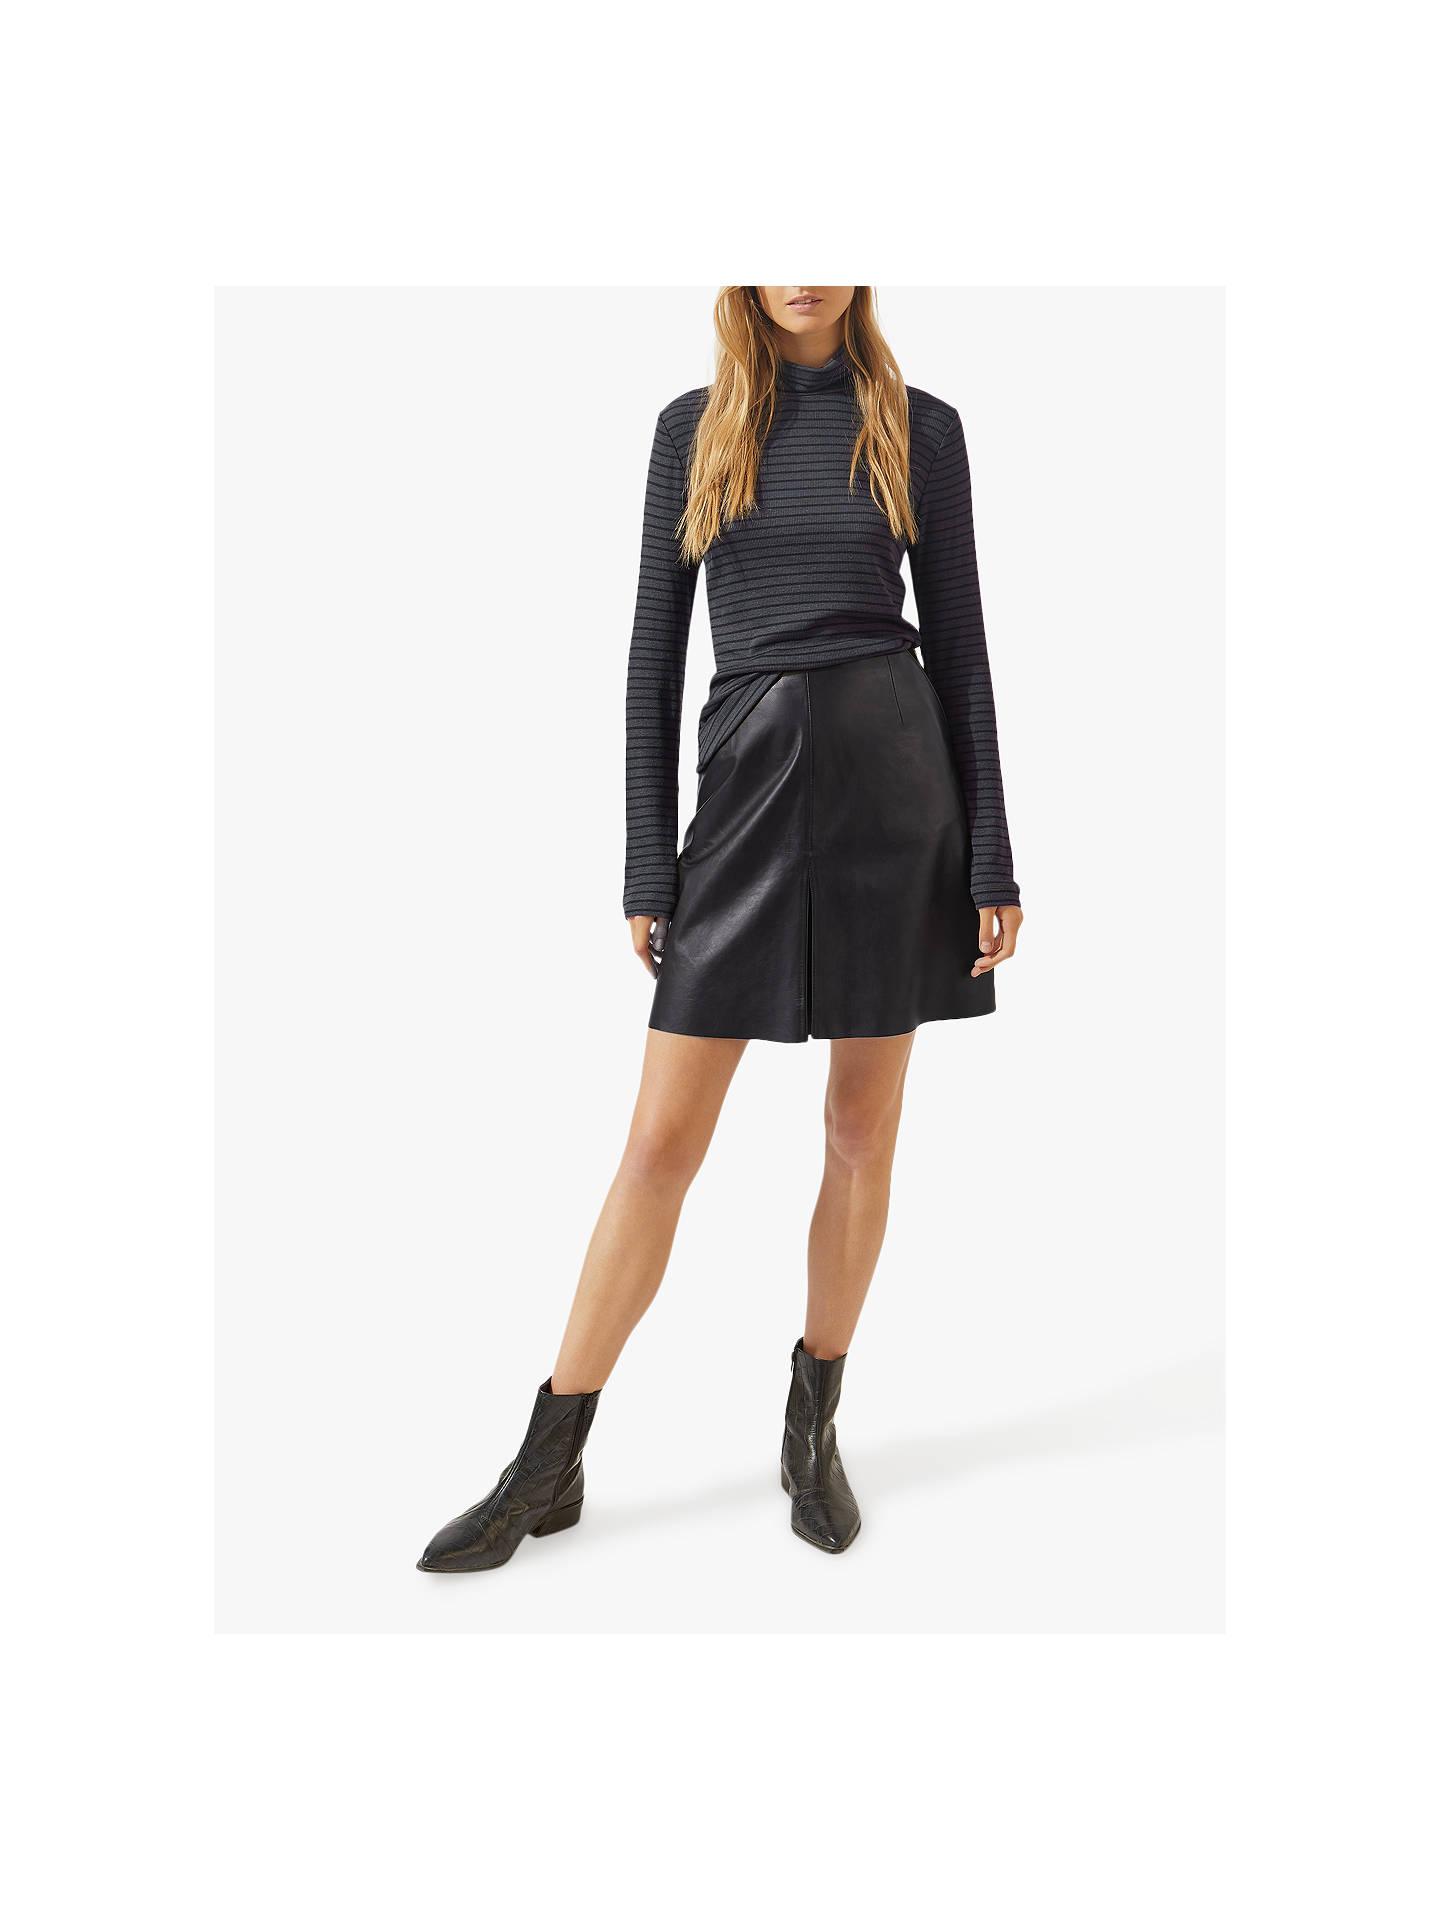 c0f9b71b1 Buy Jigsaw Mini Pleated Front Leather Skirt, Black, 6 Online at  johnlewis.com ...